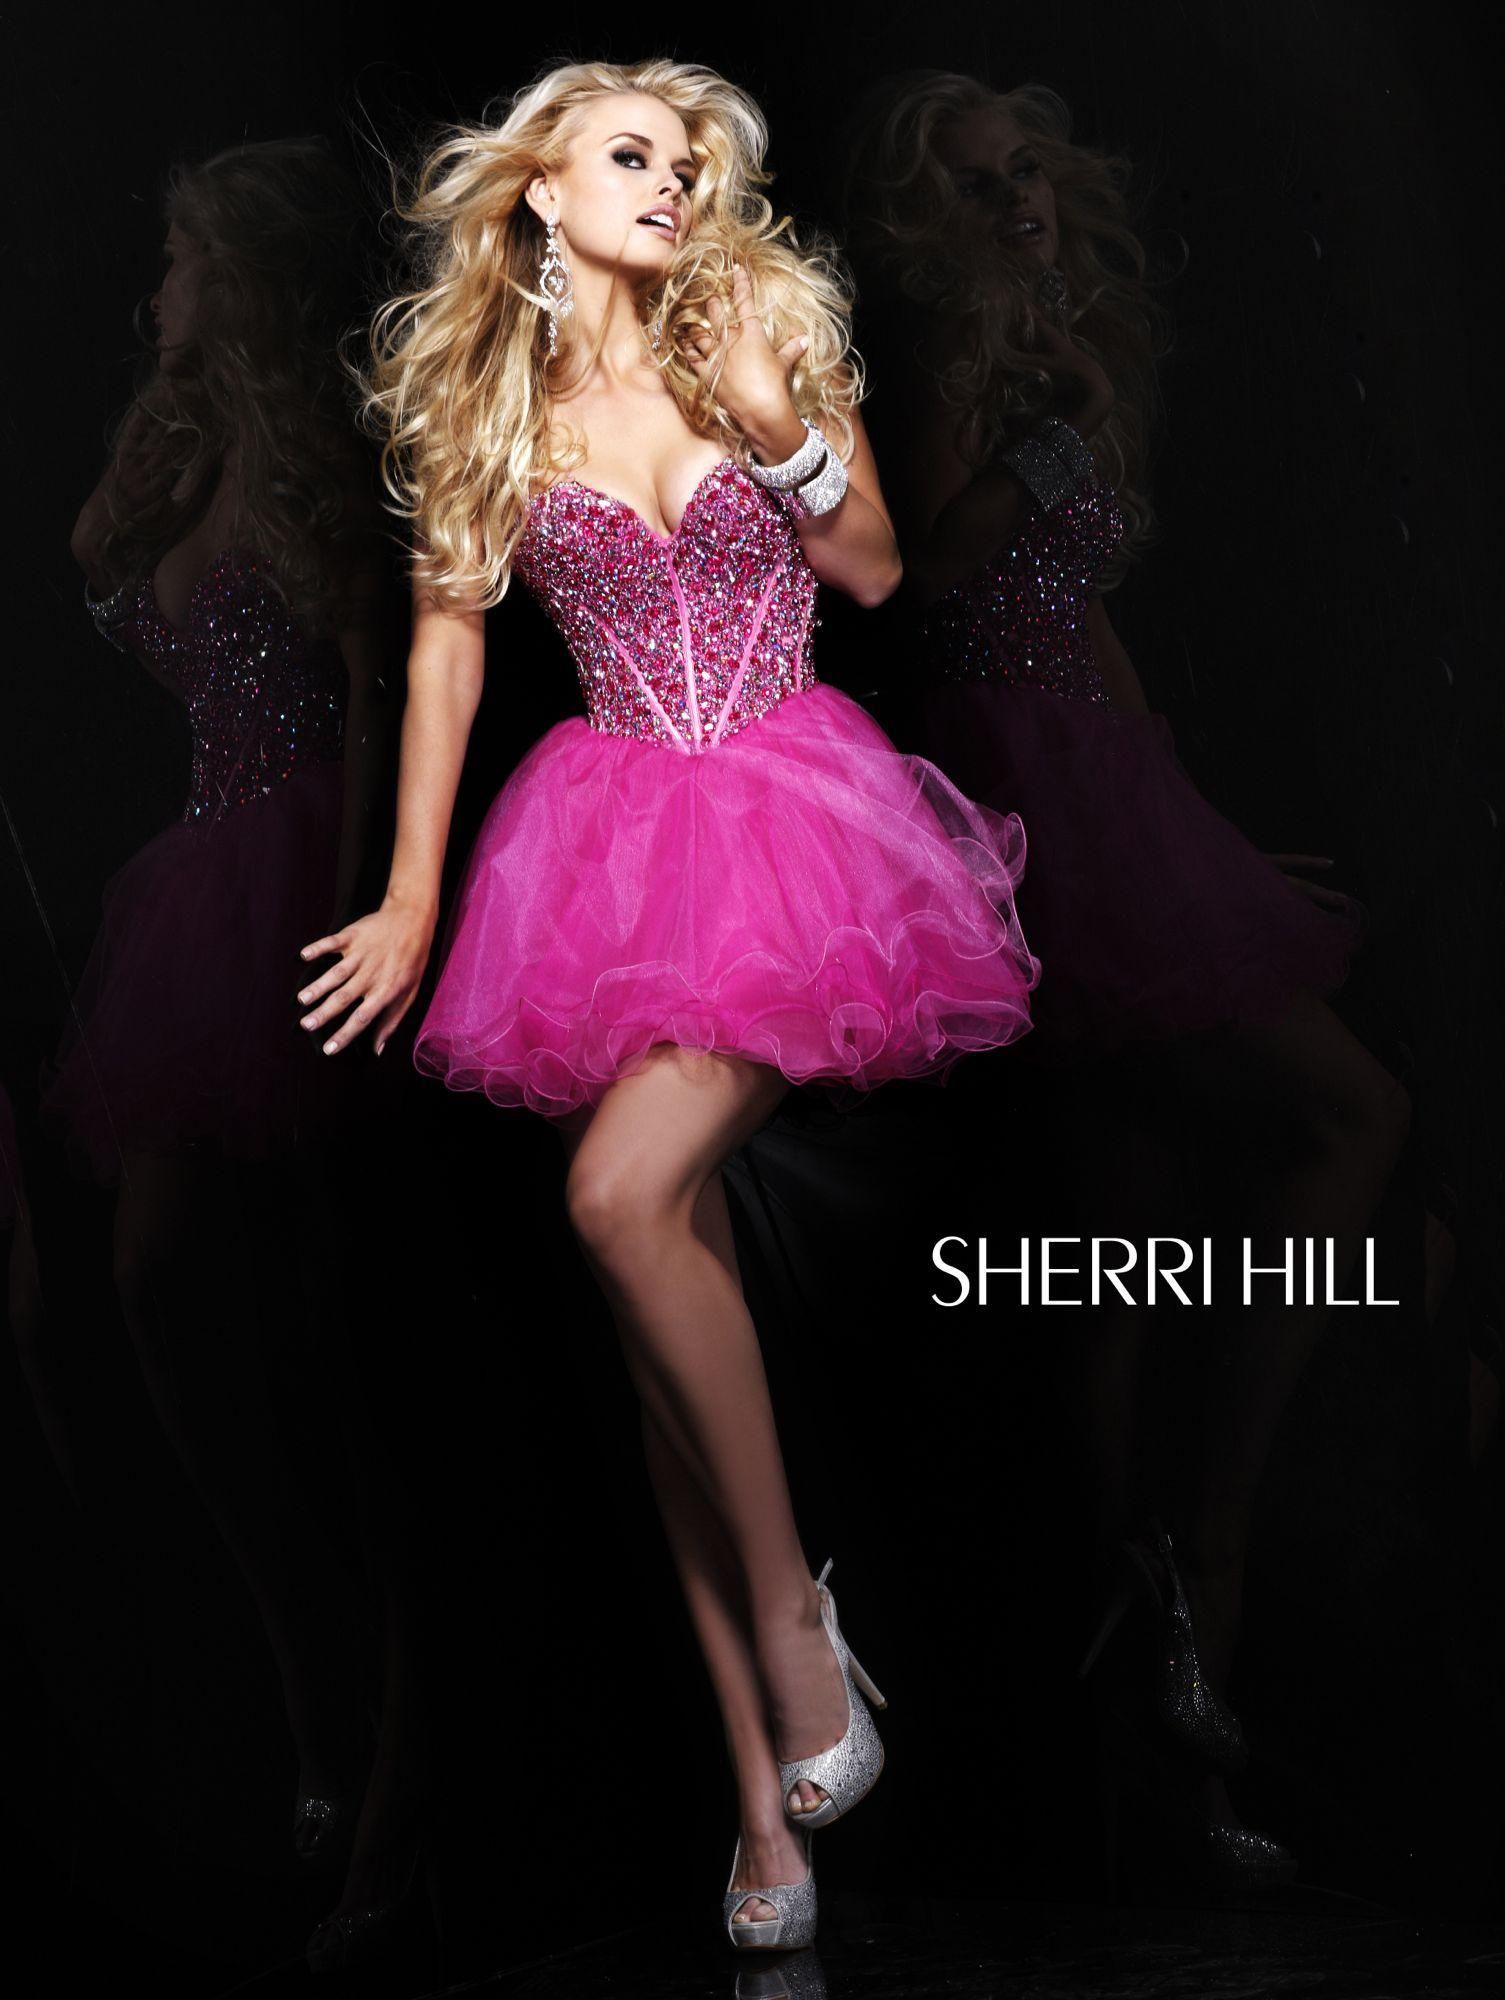 sherri hill | Cumpleaños de 15 | Pinterest | Cumpleaños de 15 y ...